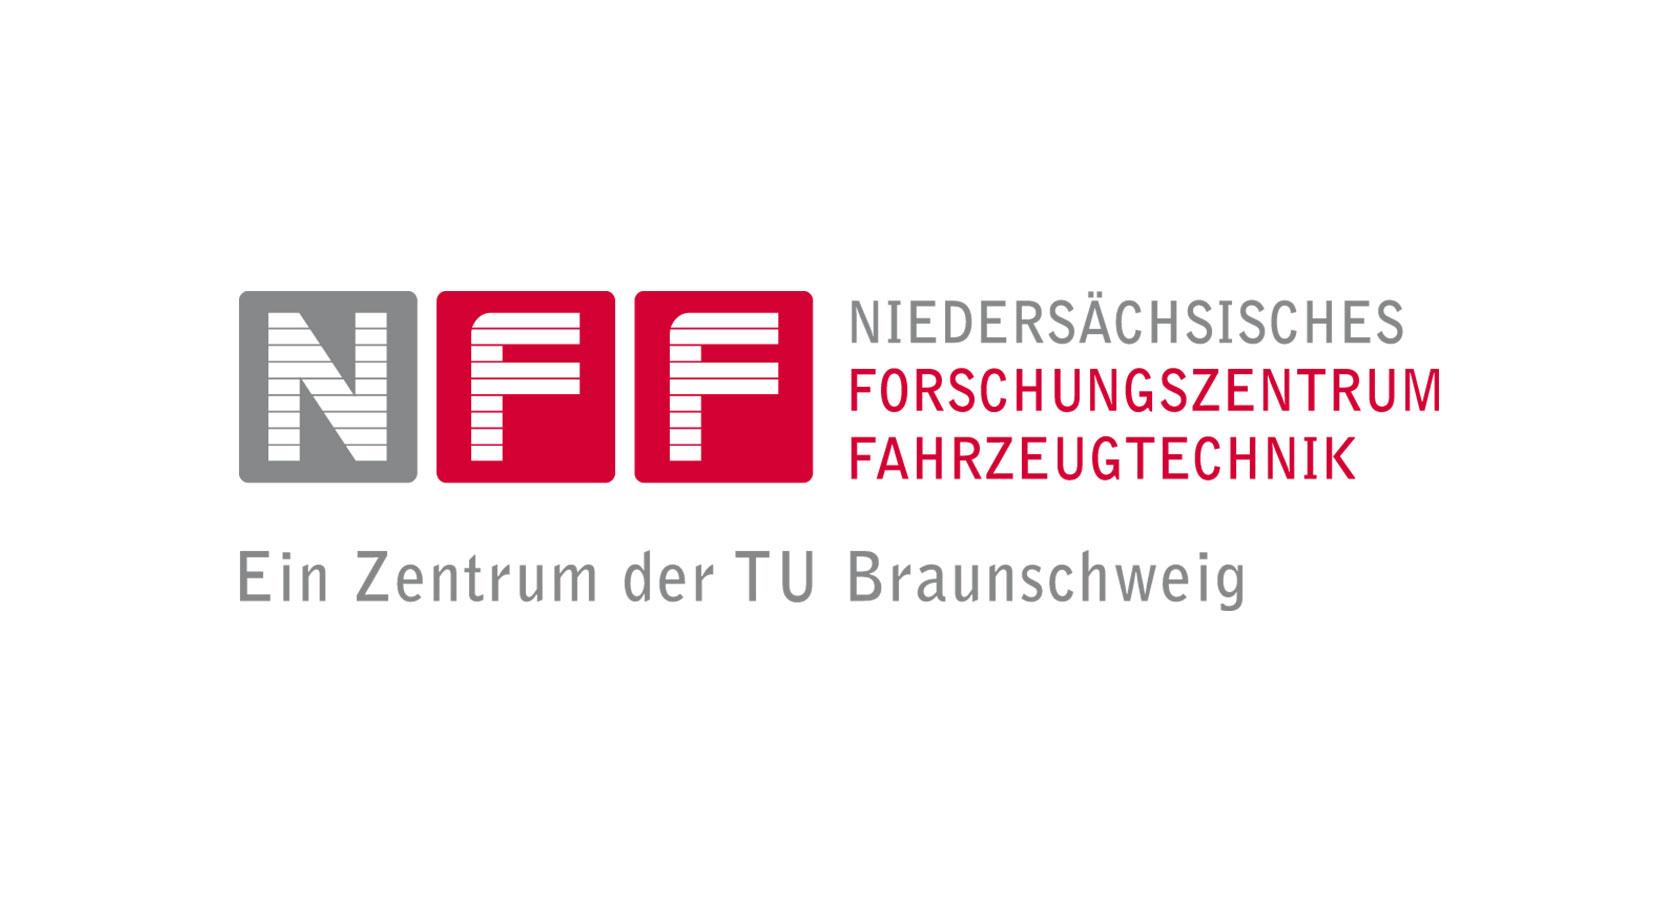 Logo des NFF (Niedersächsisches Forschungszentrum Fahrzeugtechnik)